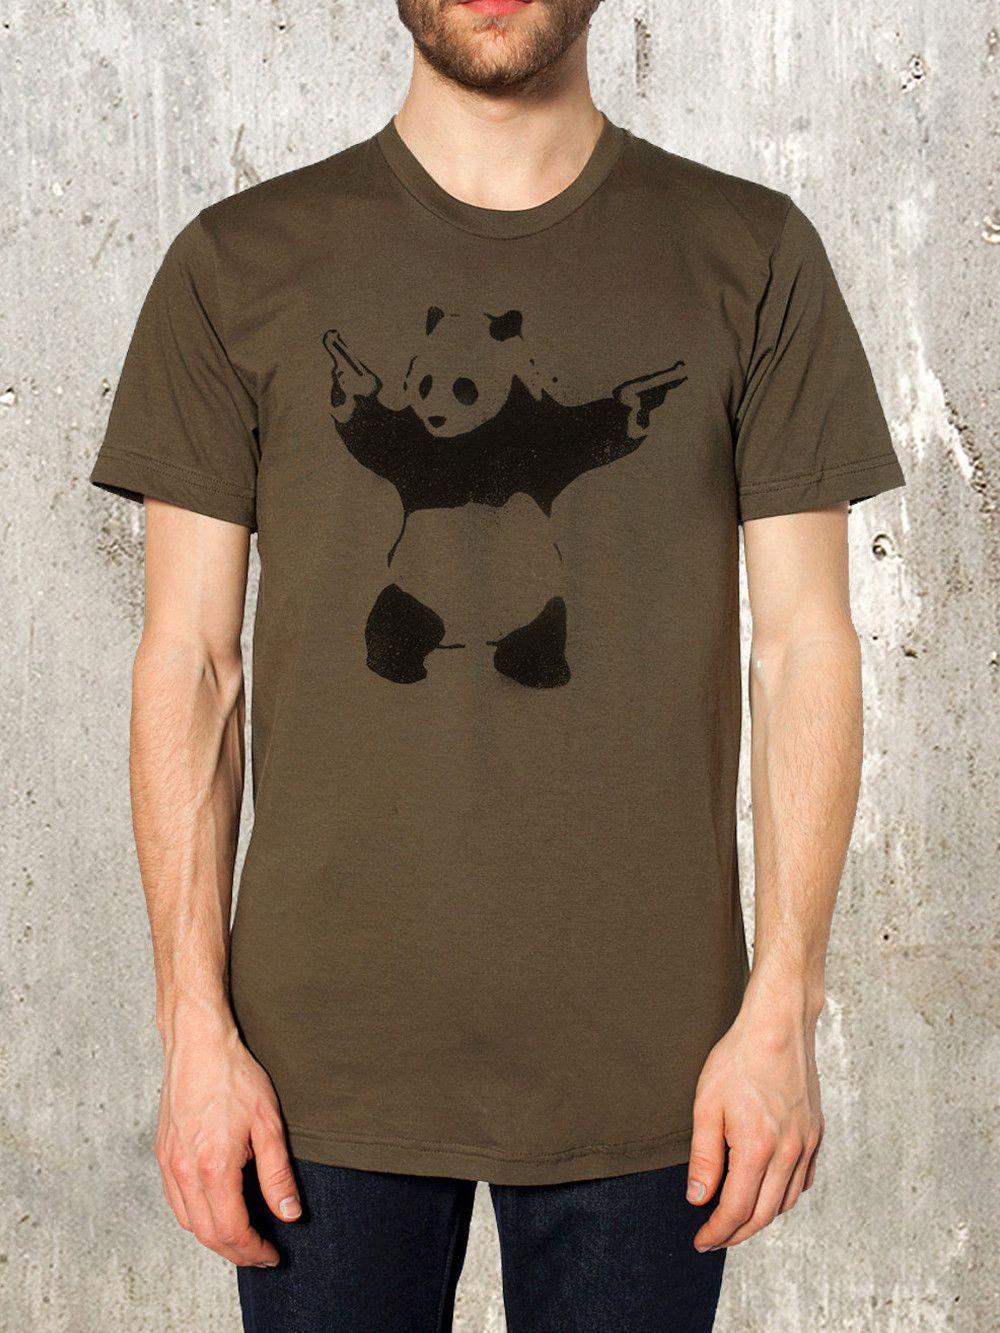 Panda Bear Street Art | Effect | Pinterest | Franela, Camisetas y ...